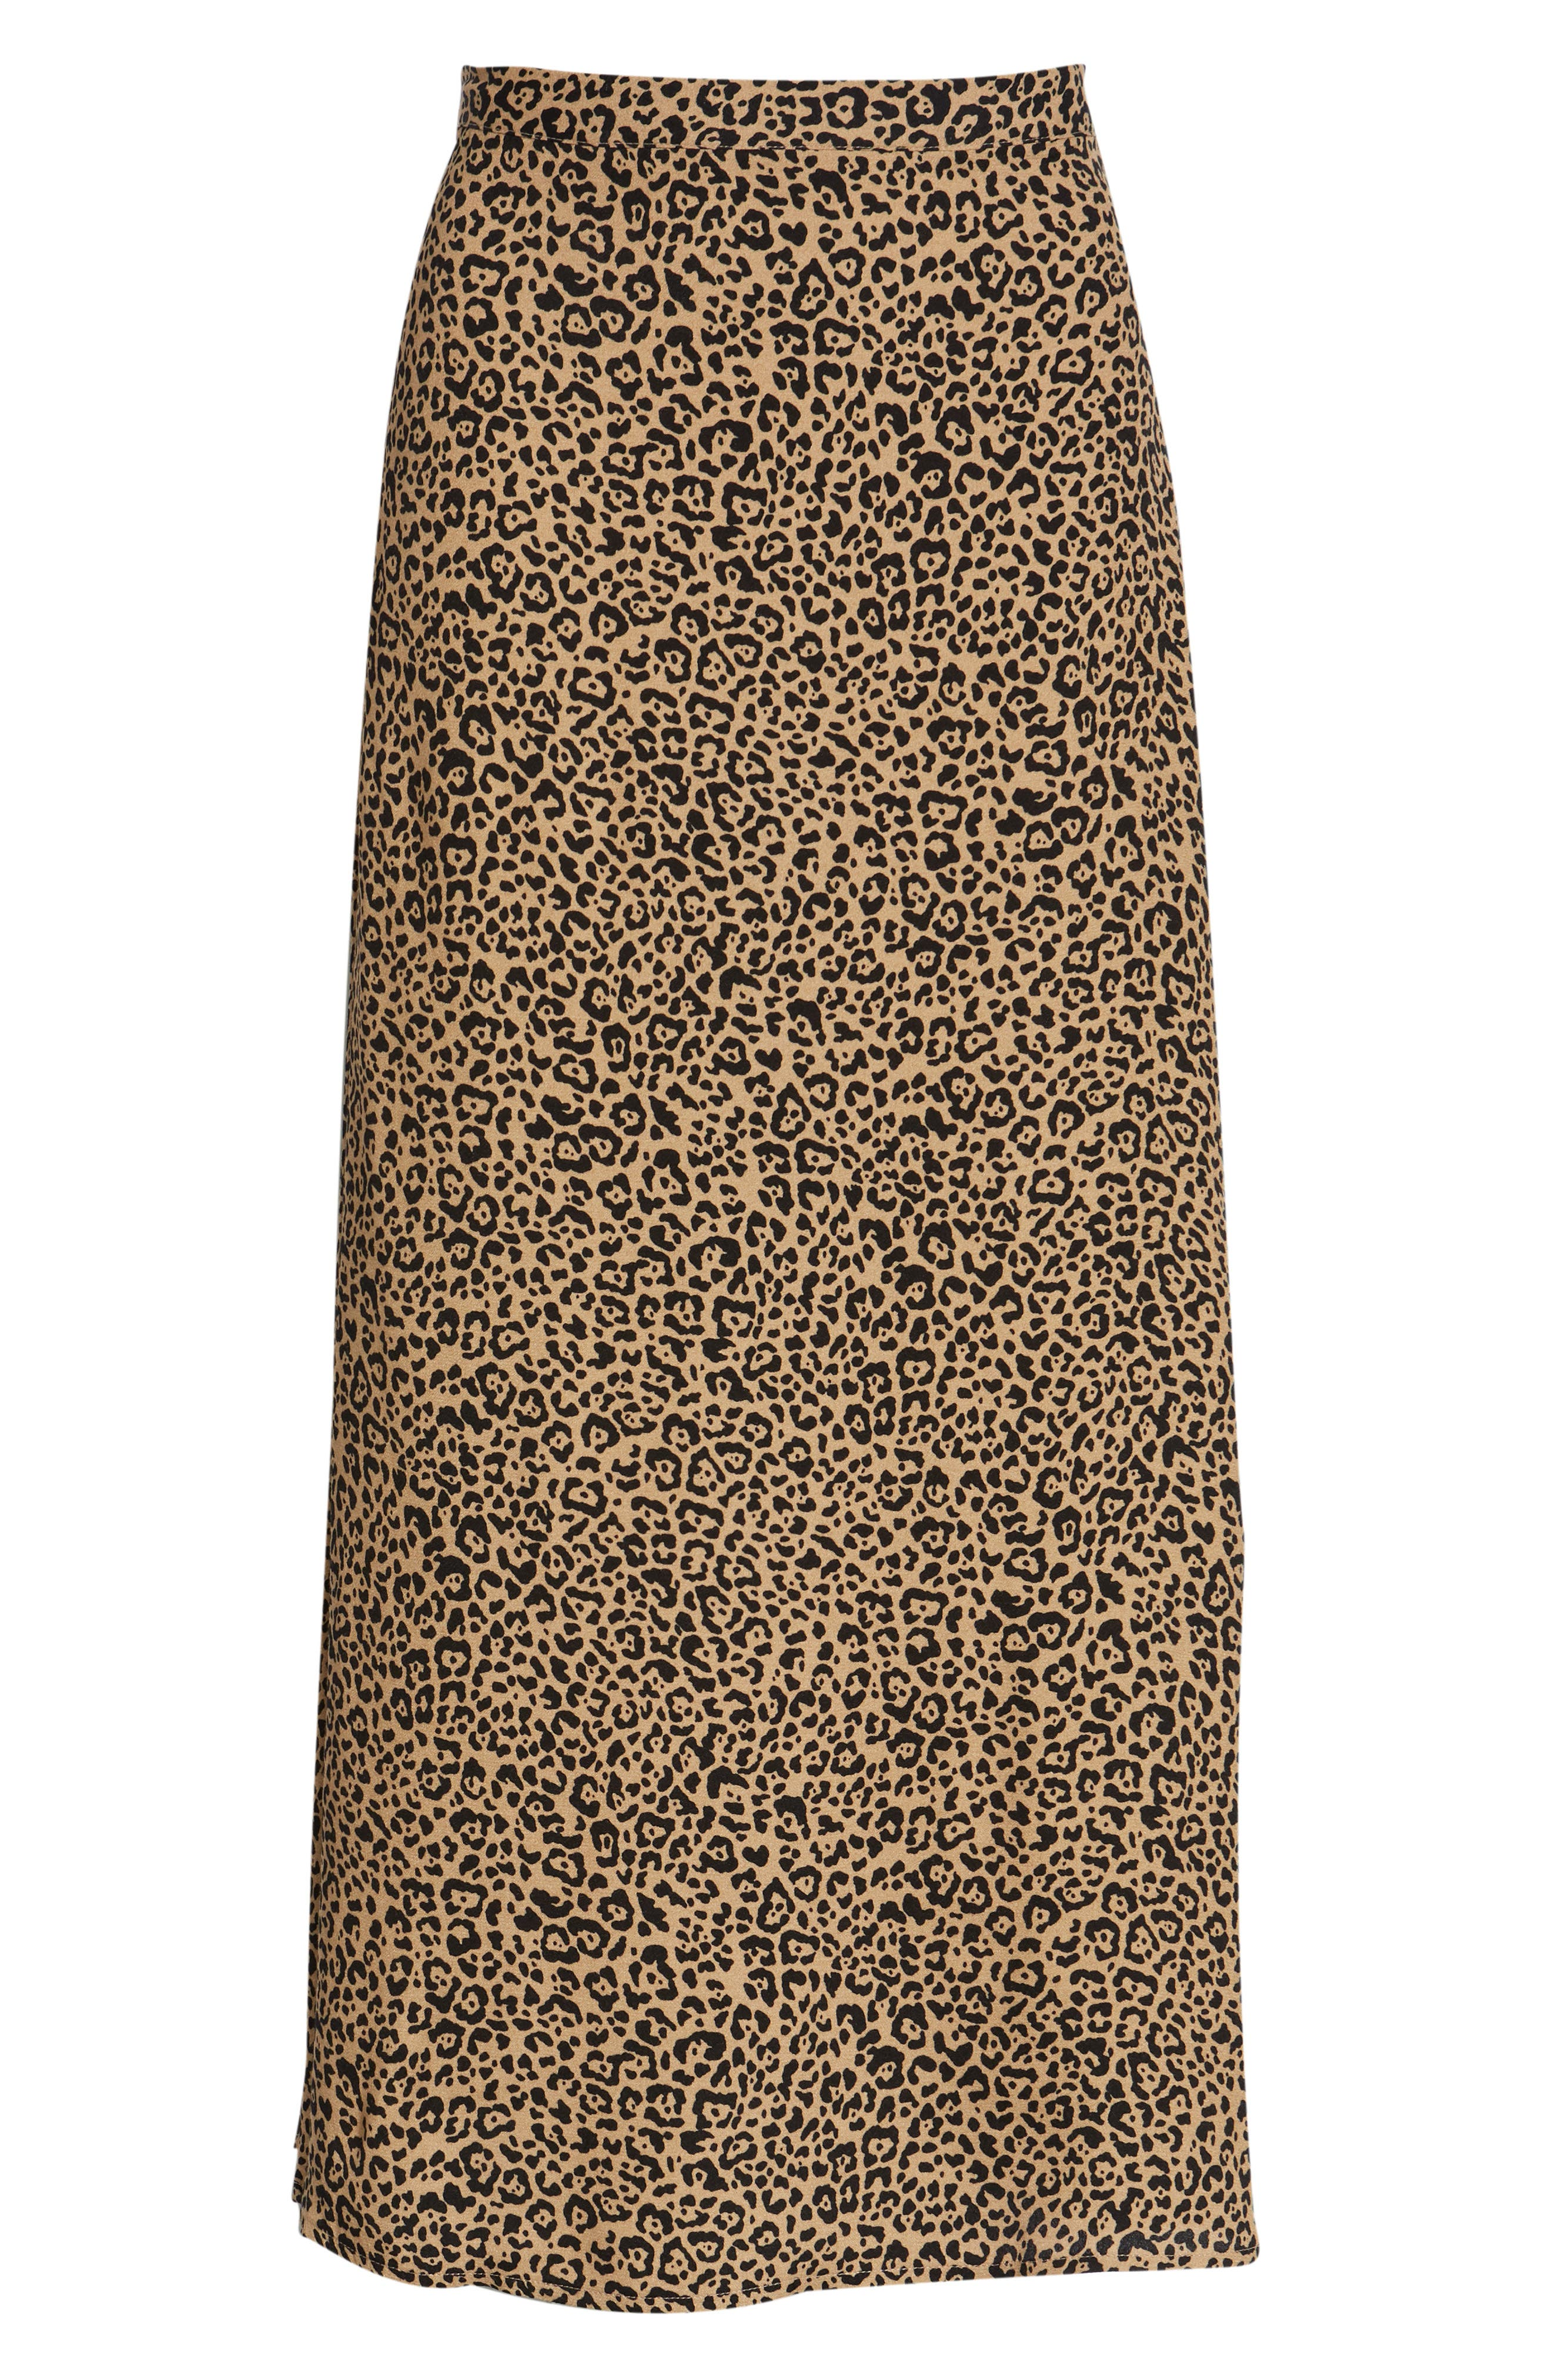 Bea Skirt,                             Alternate thumbnail 5, color,                             BENGAL